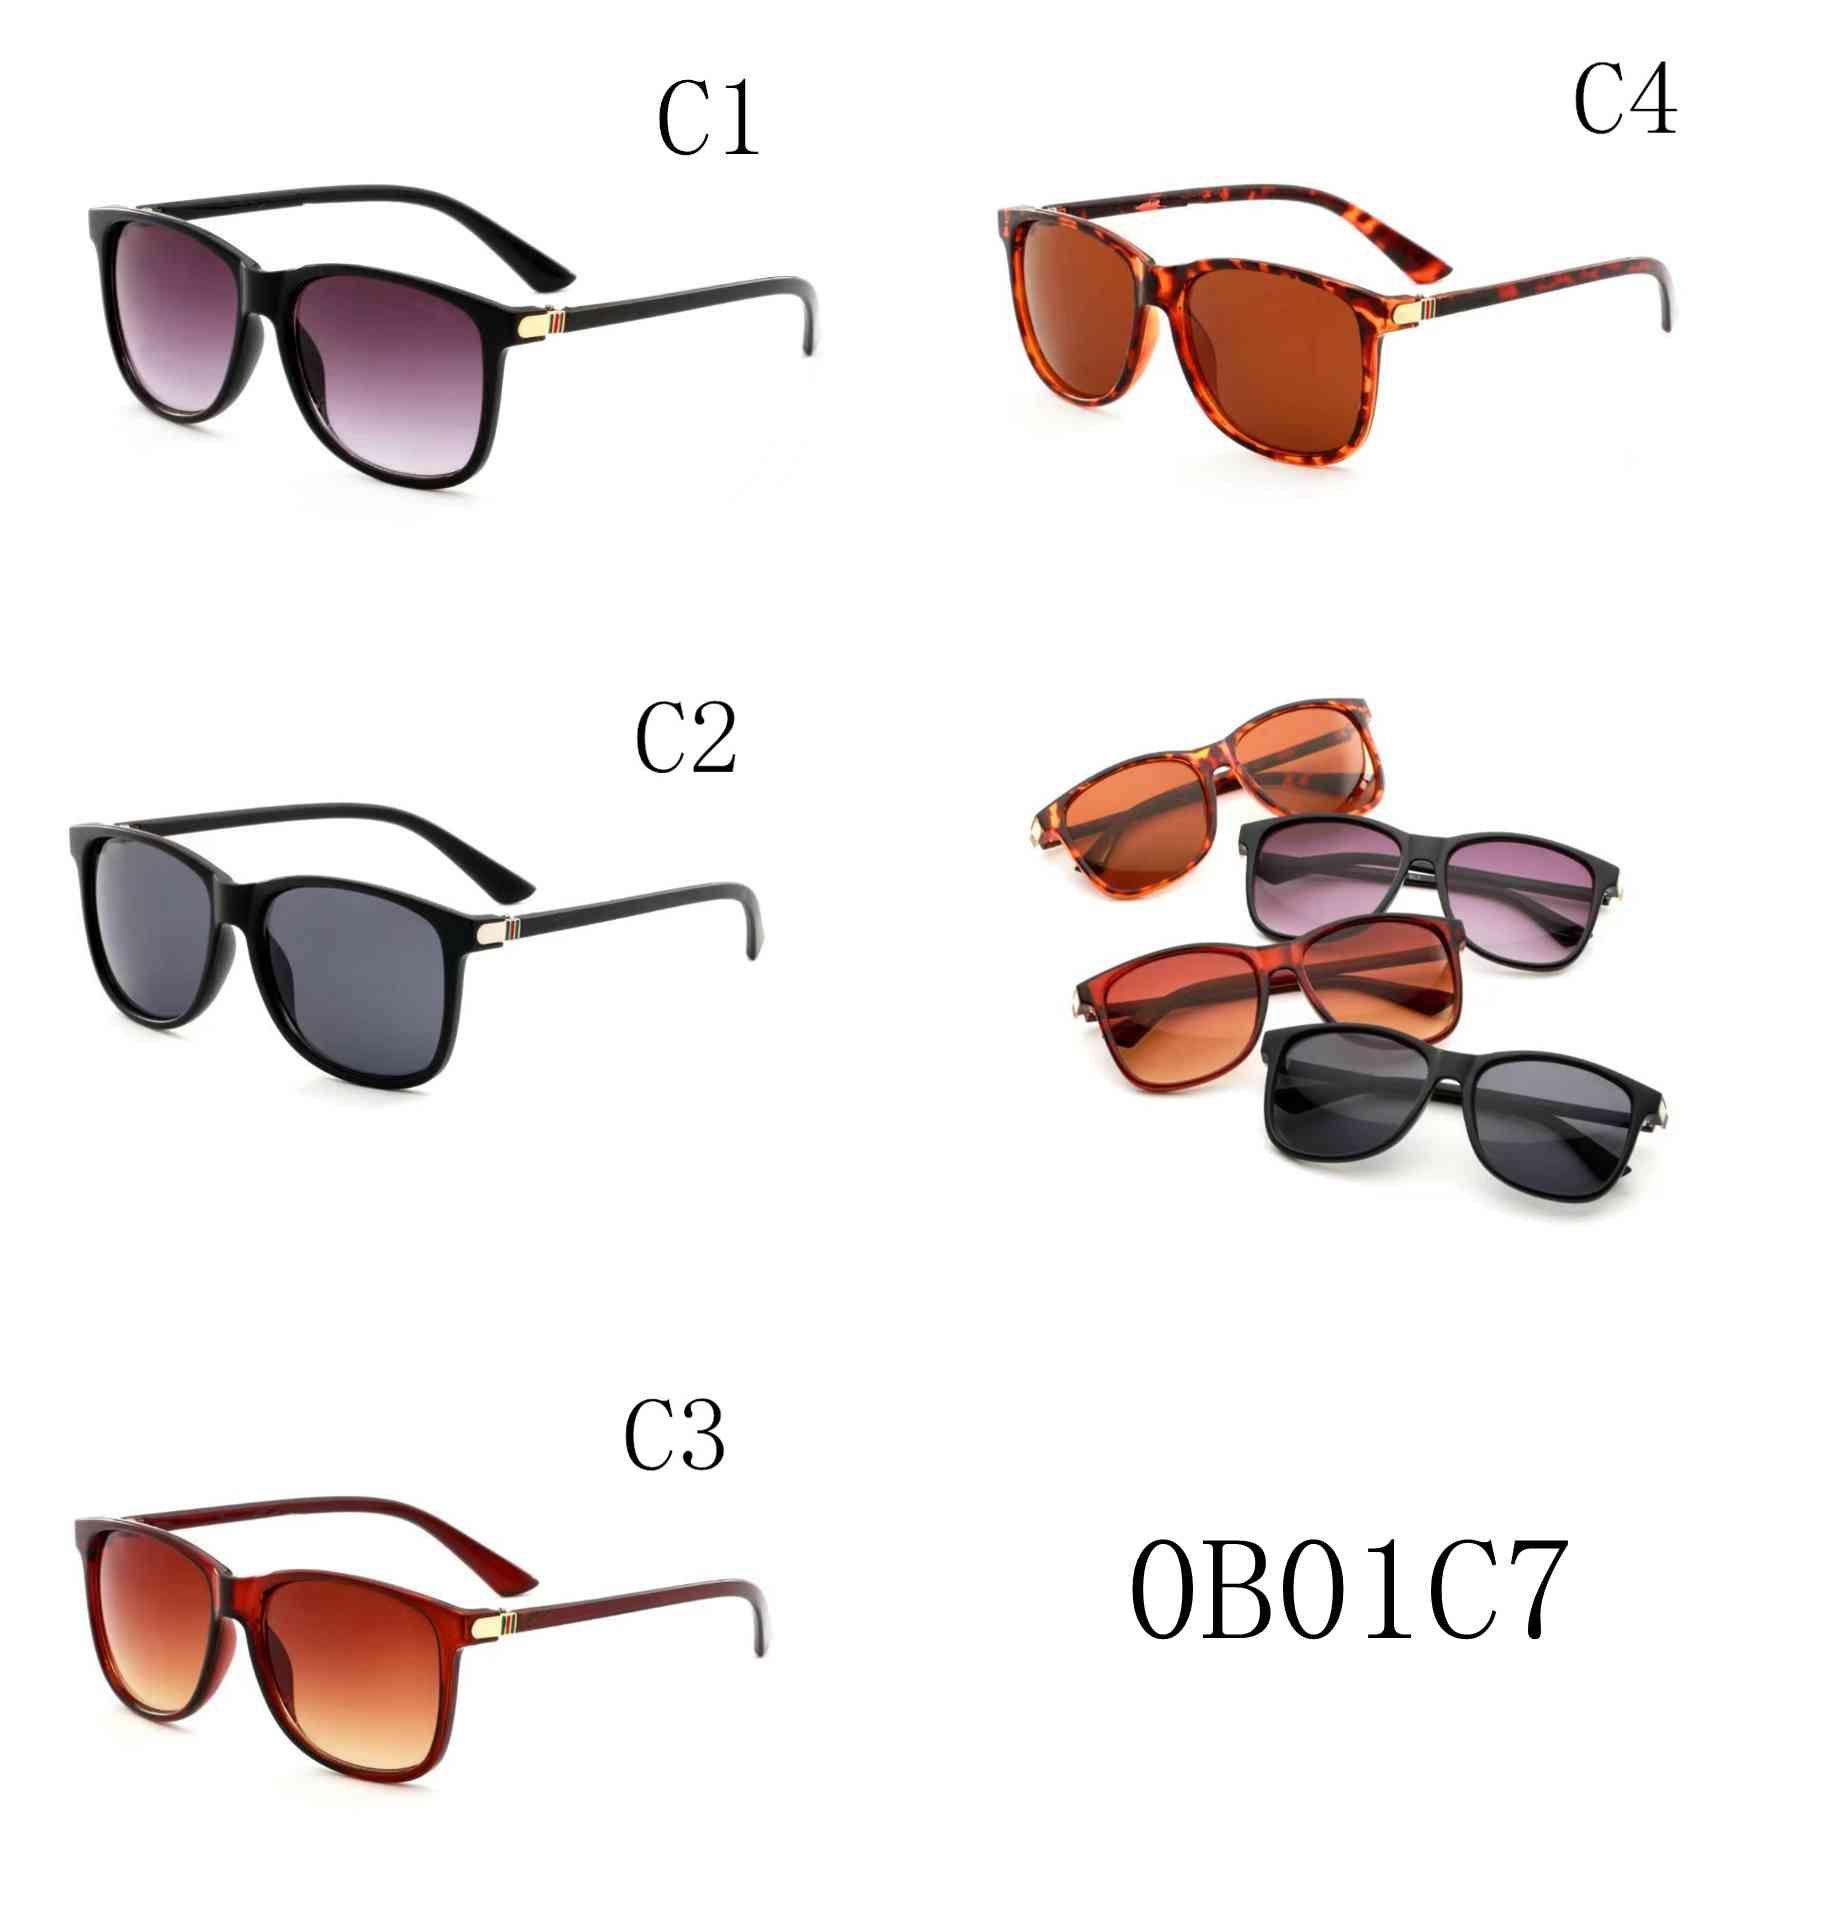 2018 new /Wholesale Sunglasses Men Classical Womens Sun Glasses Brand Designer Coating Eyewear Lunette de Soleil 0017